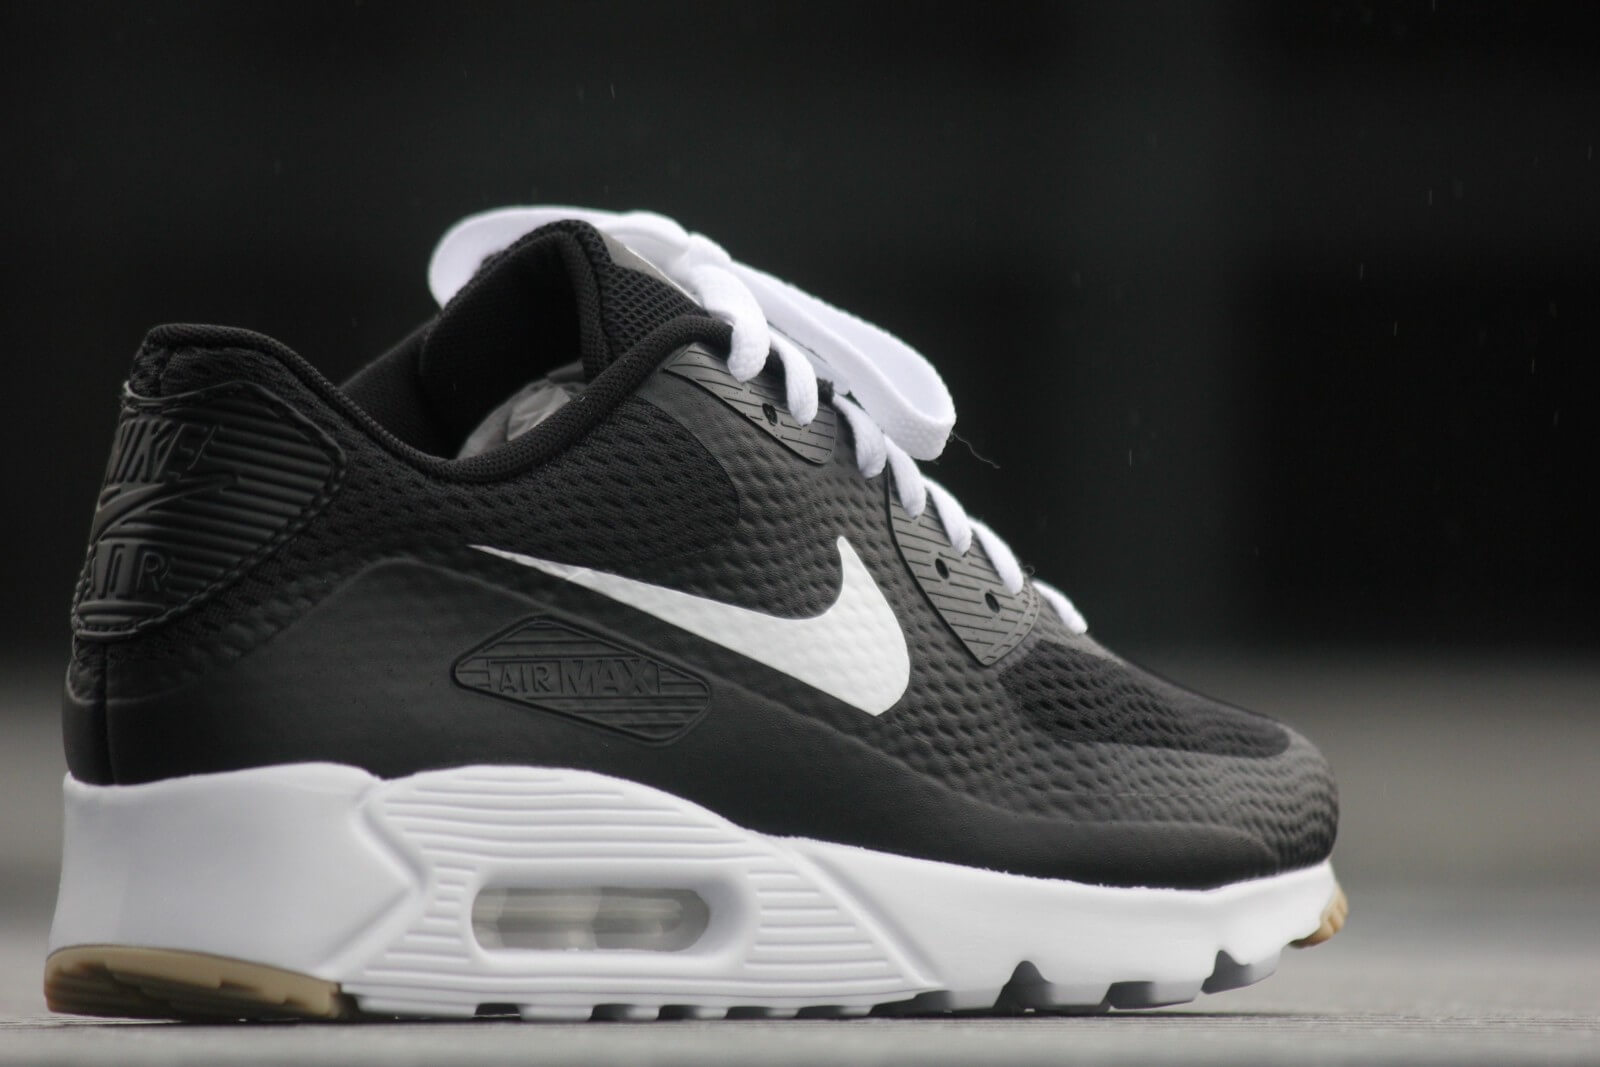 nike air max 90 essential black/white